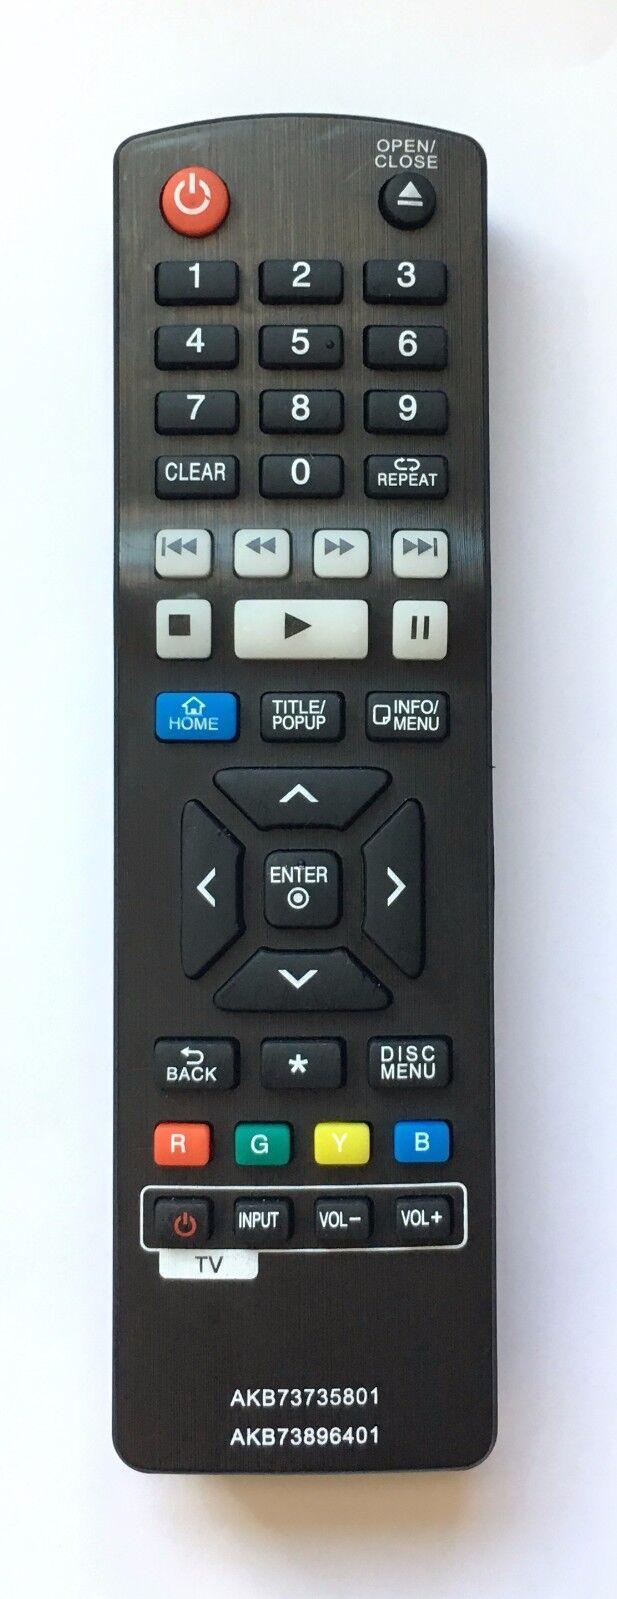 NEW USBRMT Remote AKB73735801 AKB73896401 for LG Blu-Ray DVD